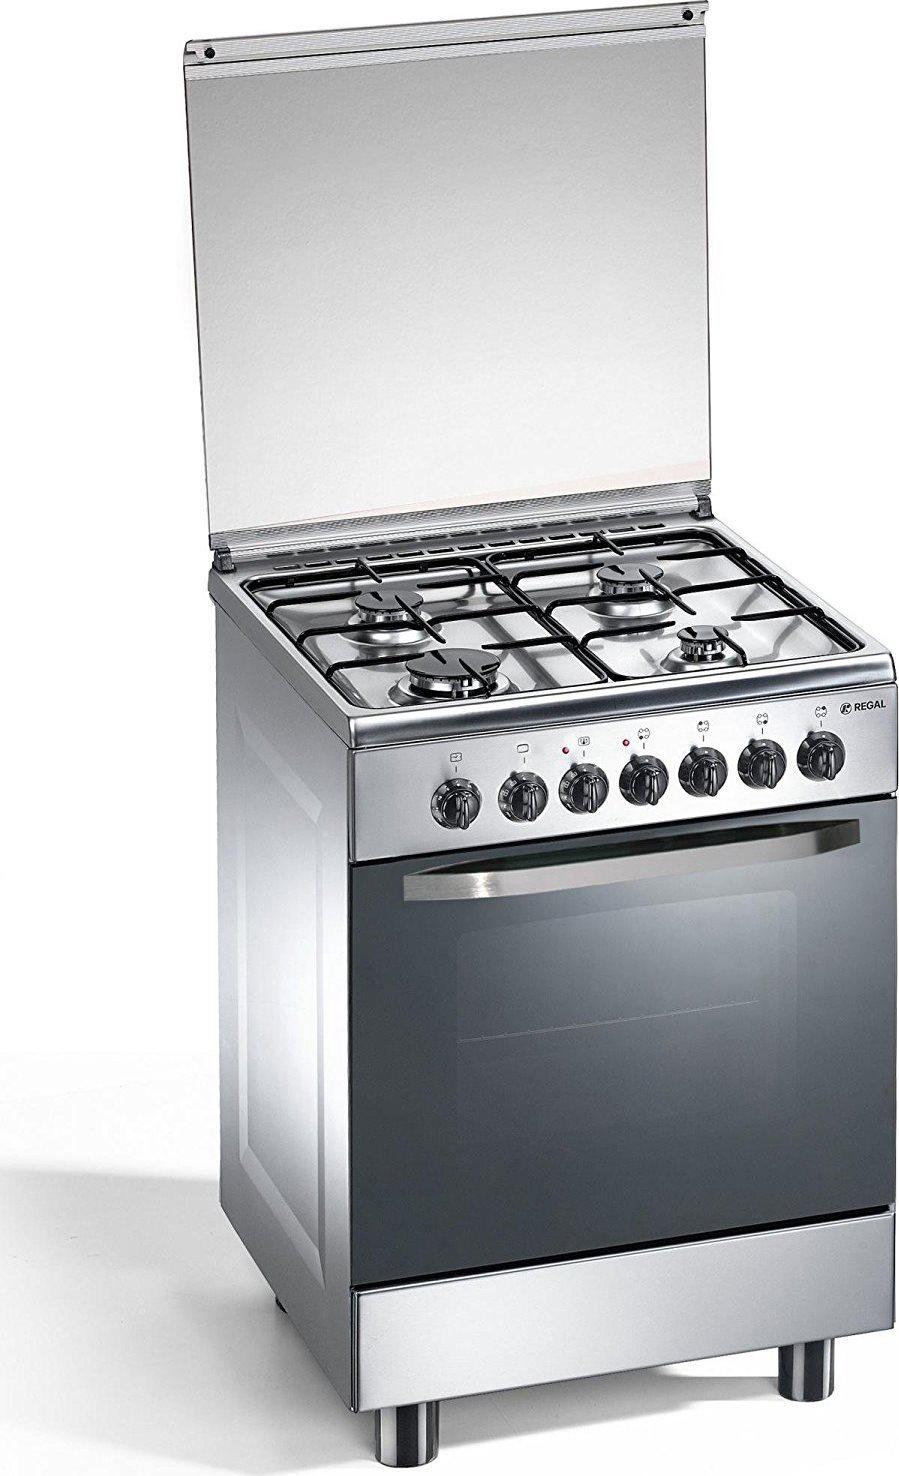 Cucina a gas regal by tecnogas rc663xsn forno elettrico - Cucina con forno a gas ...